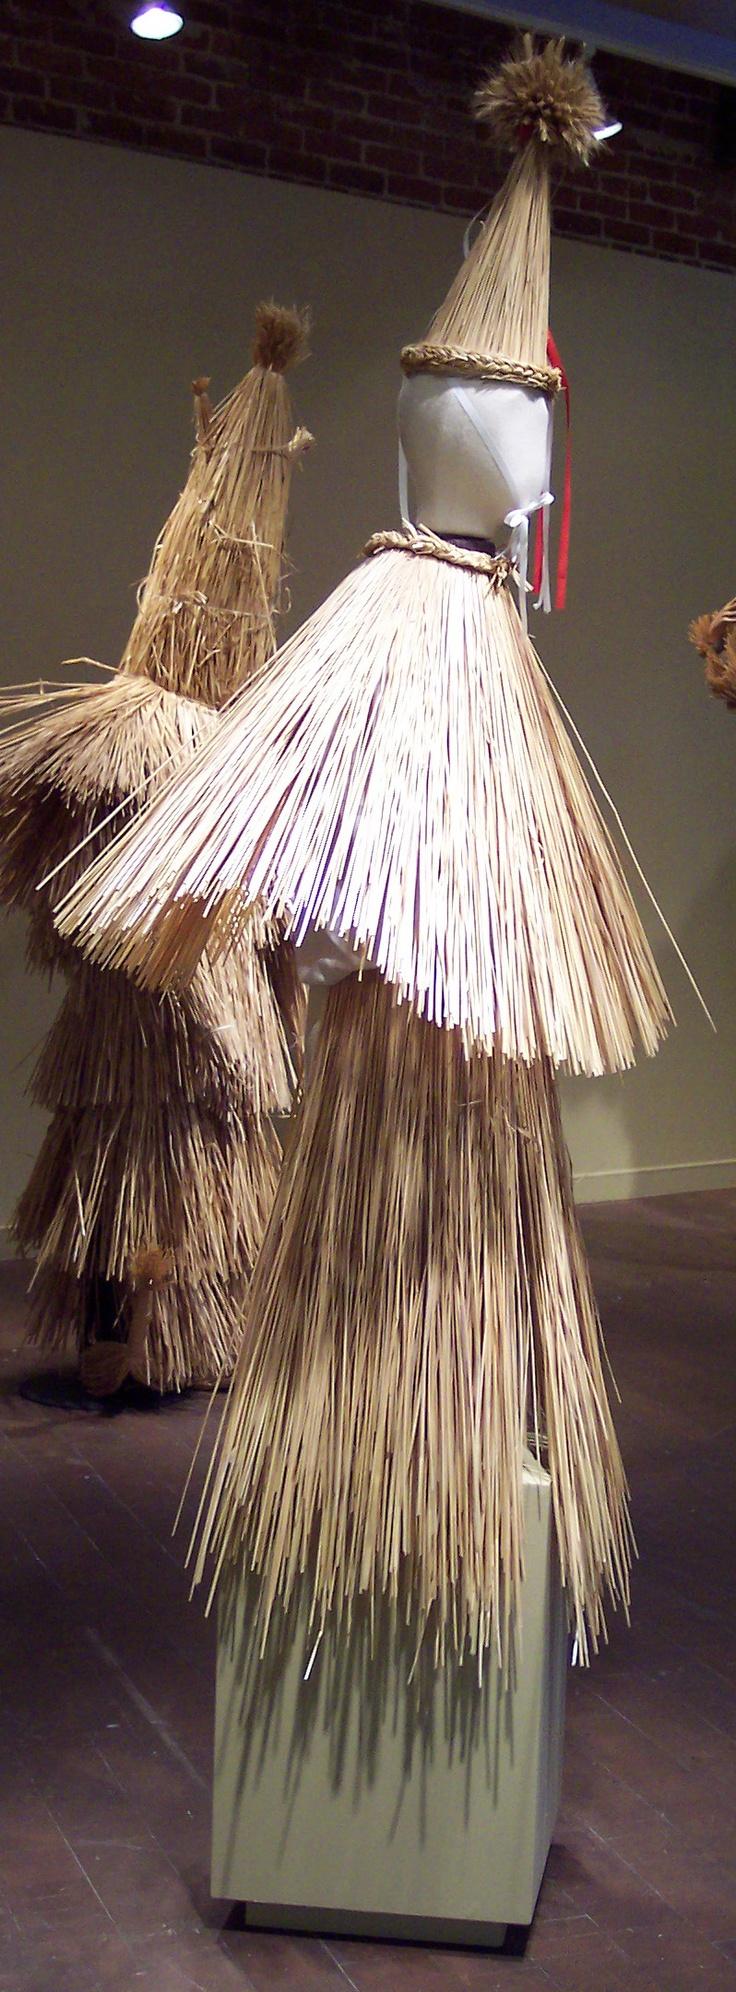 Slovak Straw Carnival Costume